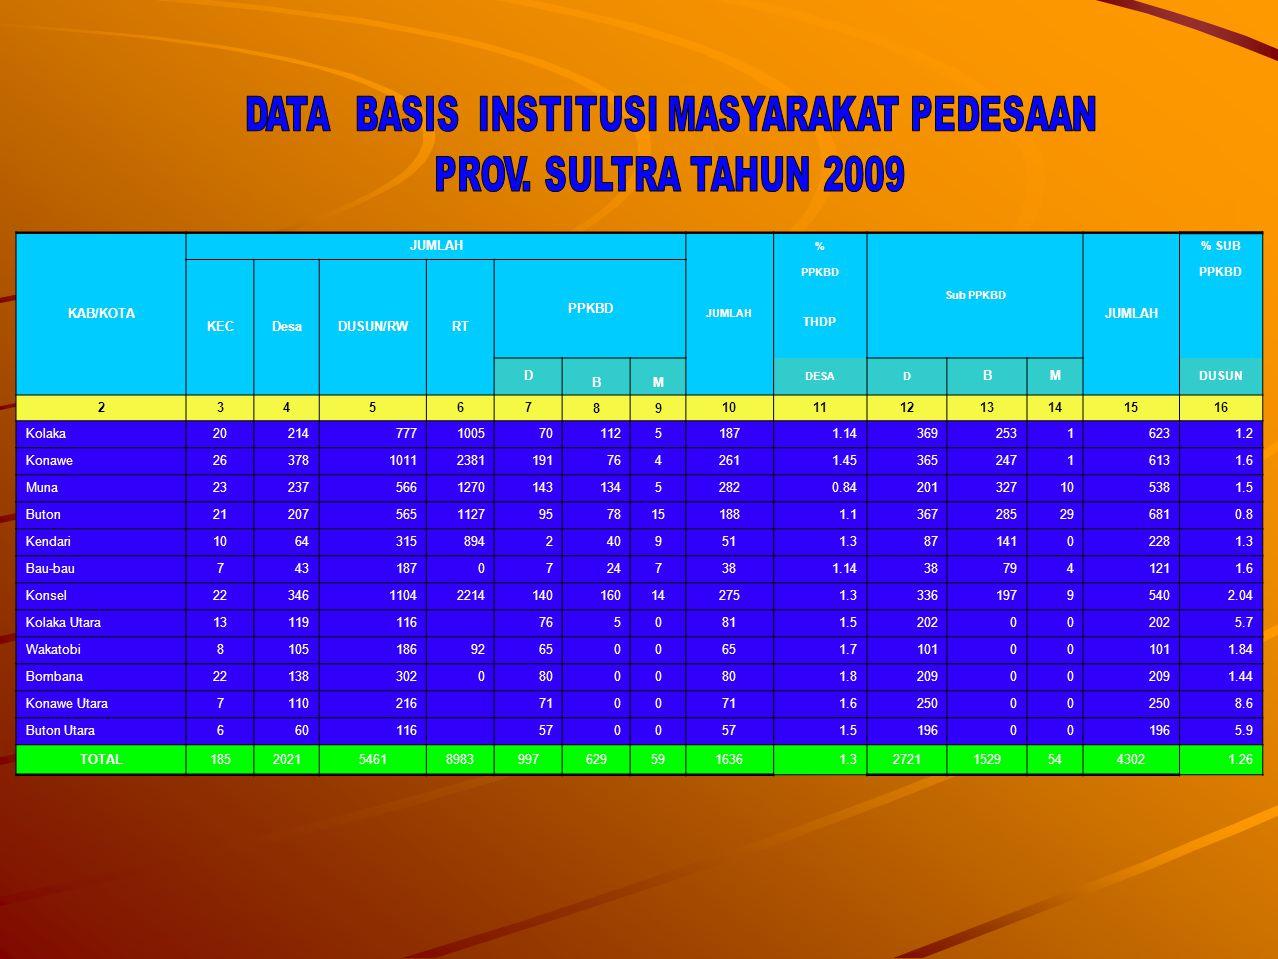 DATA BASIS INSTITUSI MASYARAKAT PEDESAAN